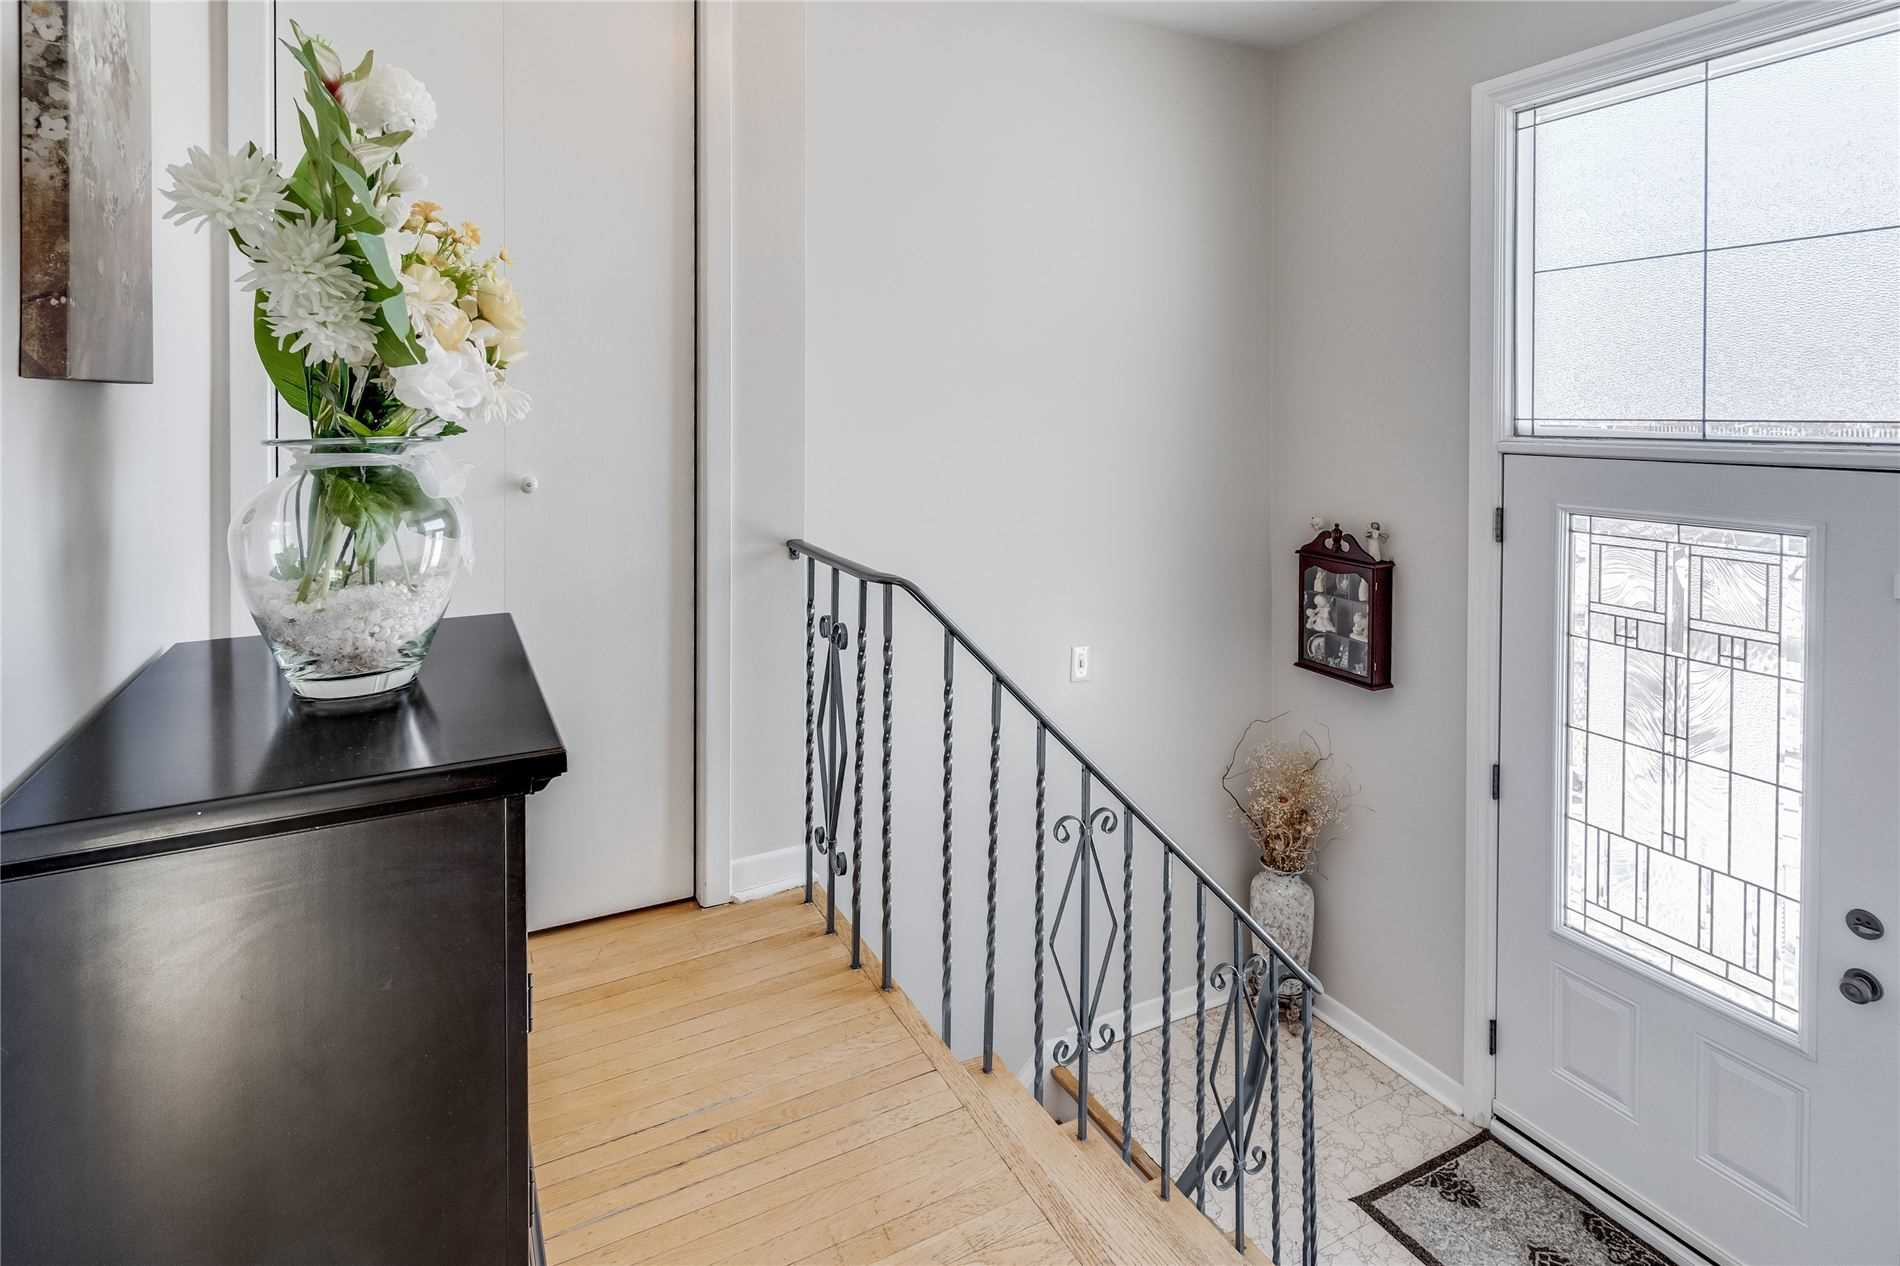 99 Anthia Dr, Toronto, Ontario M9L1K7, 4 Bedrooms Bedrooms, 10 Rooms Rooms,2 BathroomsBathrooms,Semi-detached,For Sale,Anthia,W5133437